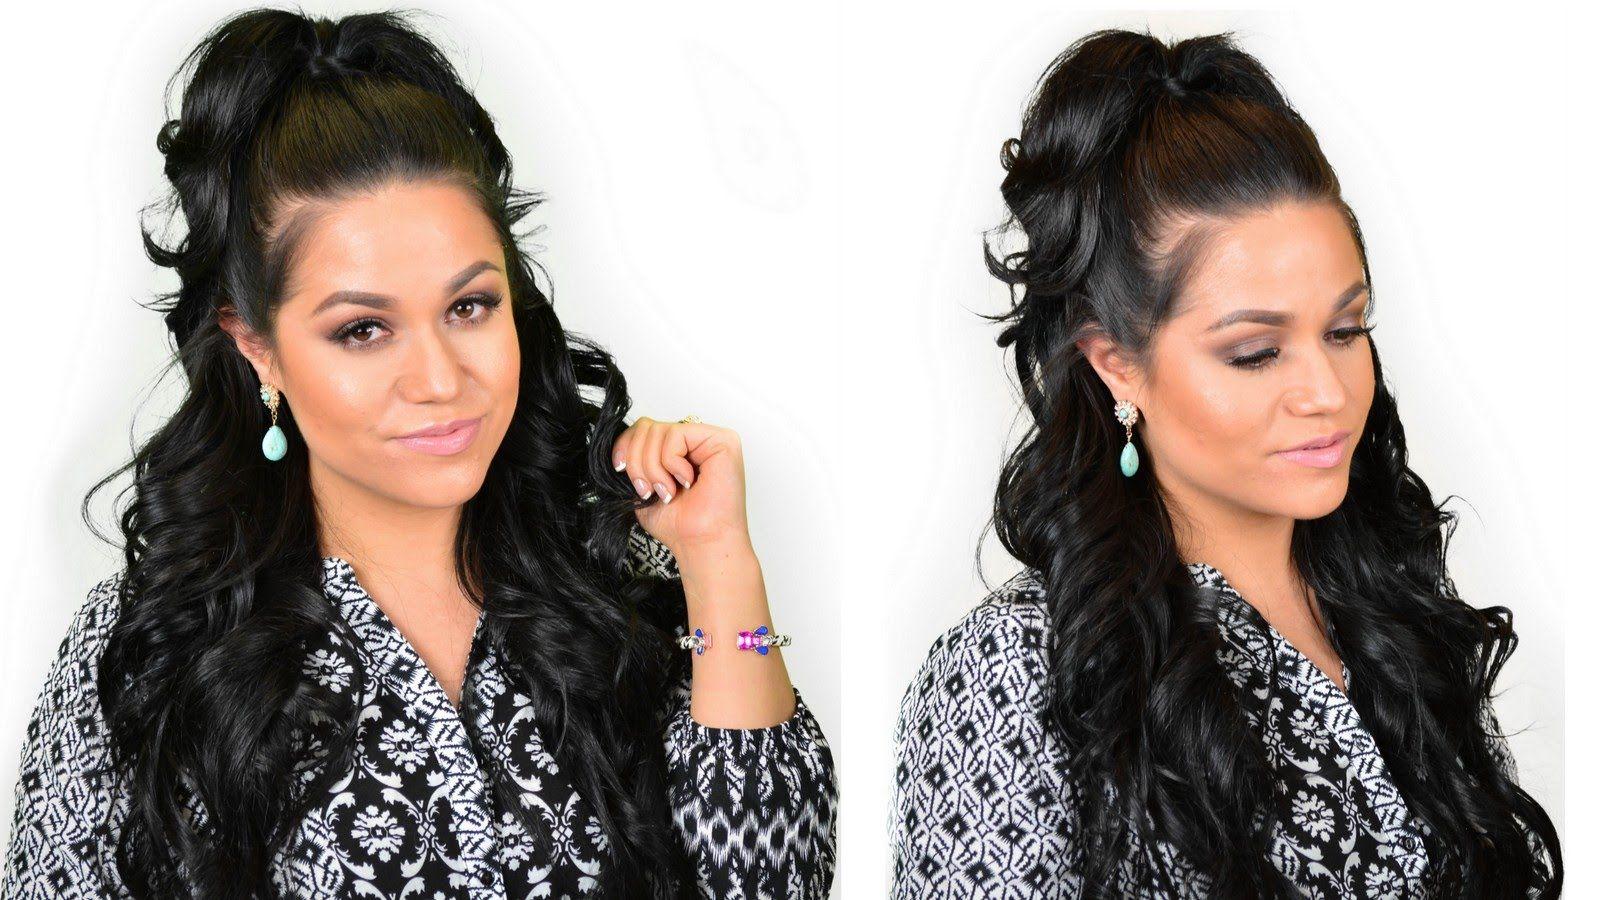 Khloe Kardashian Half Up High Ponytail Hairstyle Using Clip In Hair